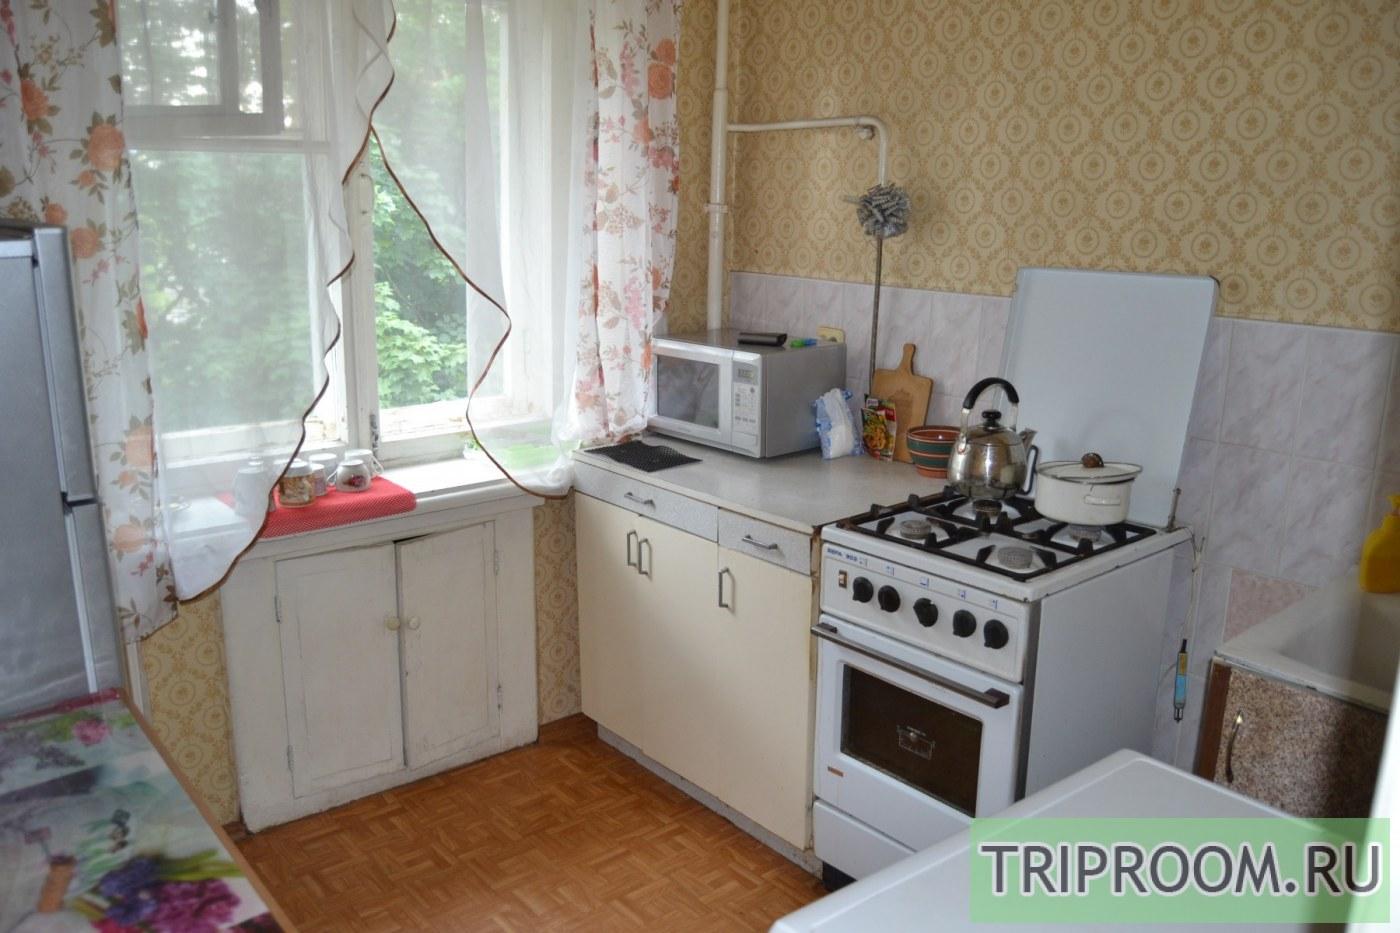 1-комнатная квартира посуточно (вариант № 38767), ул. Дохтурова улица, фото № 2